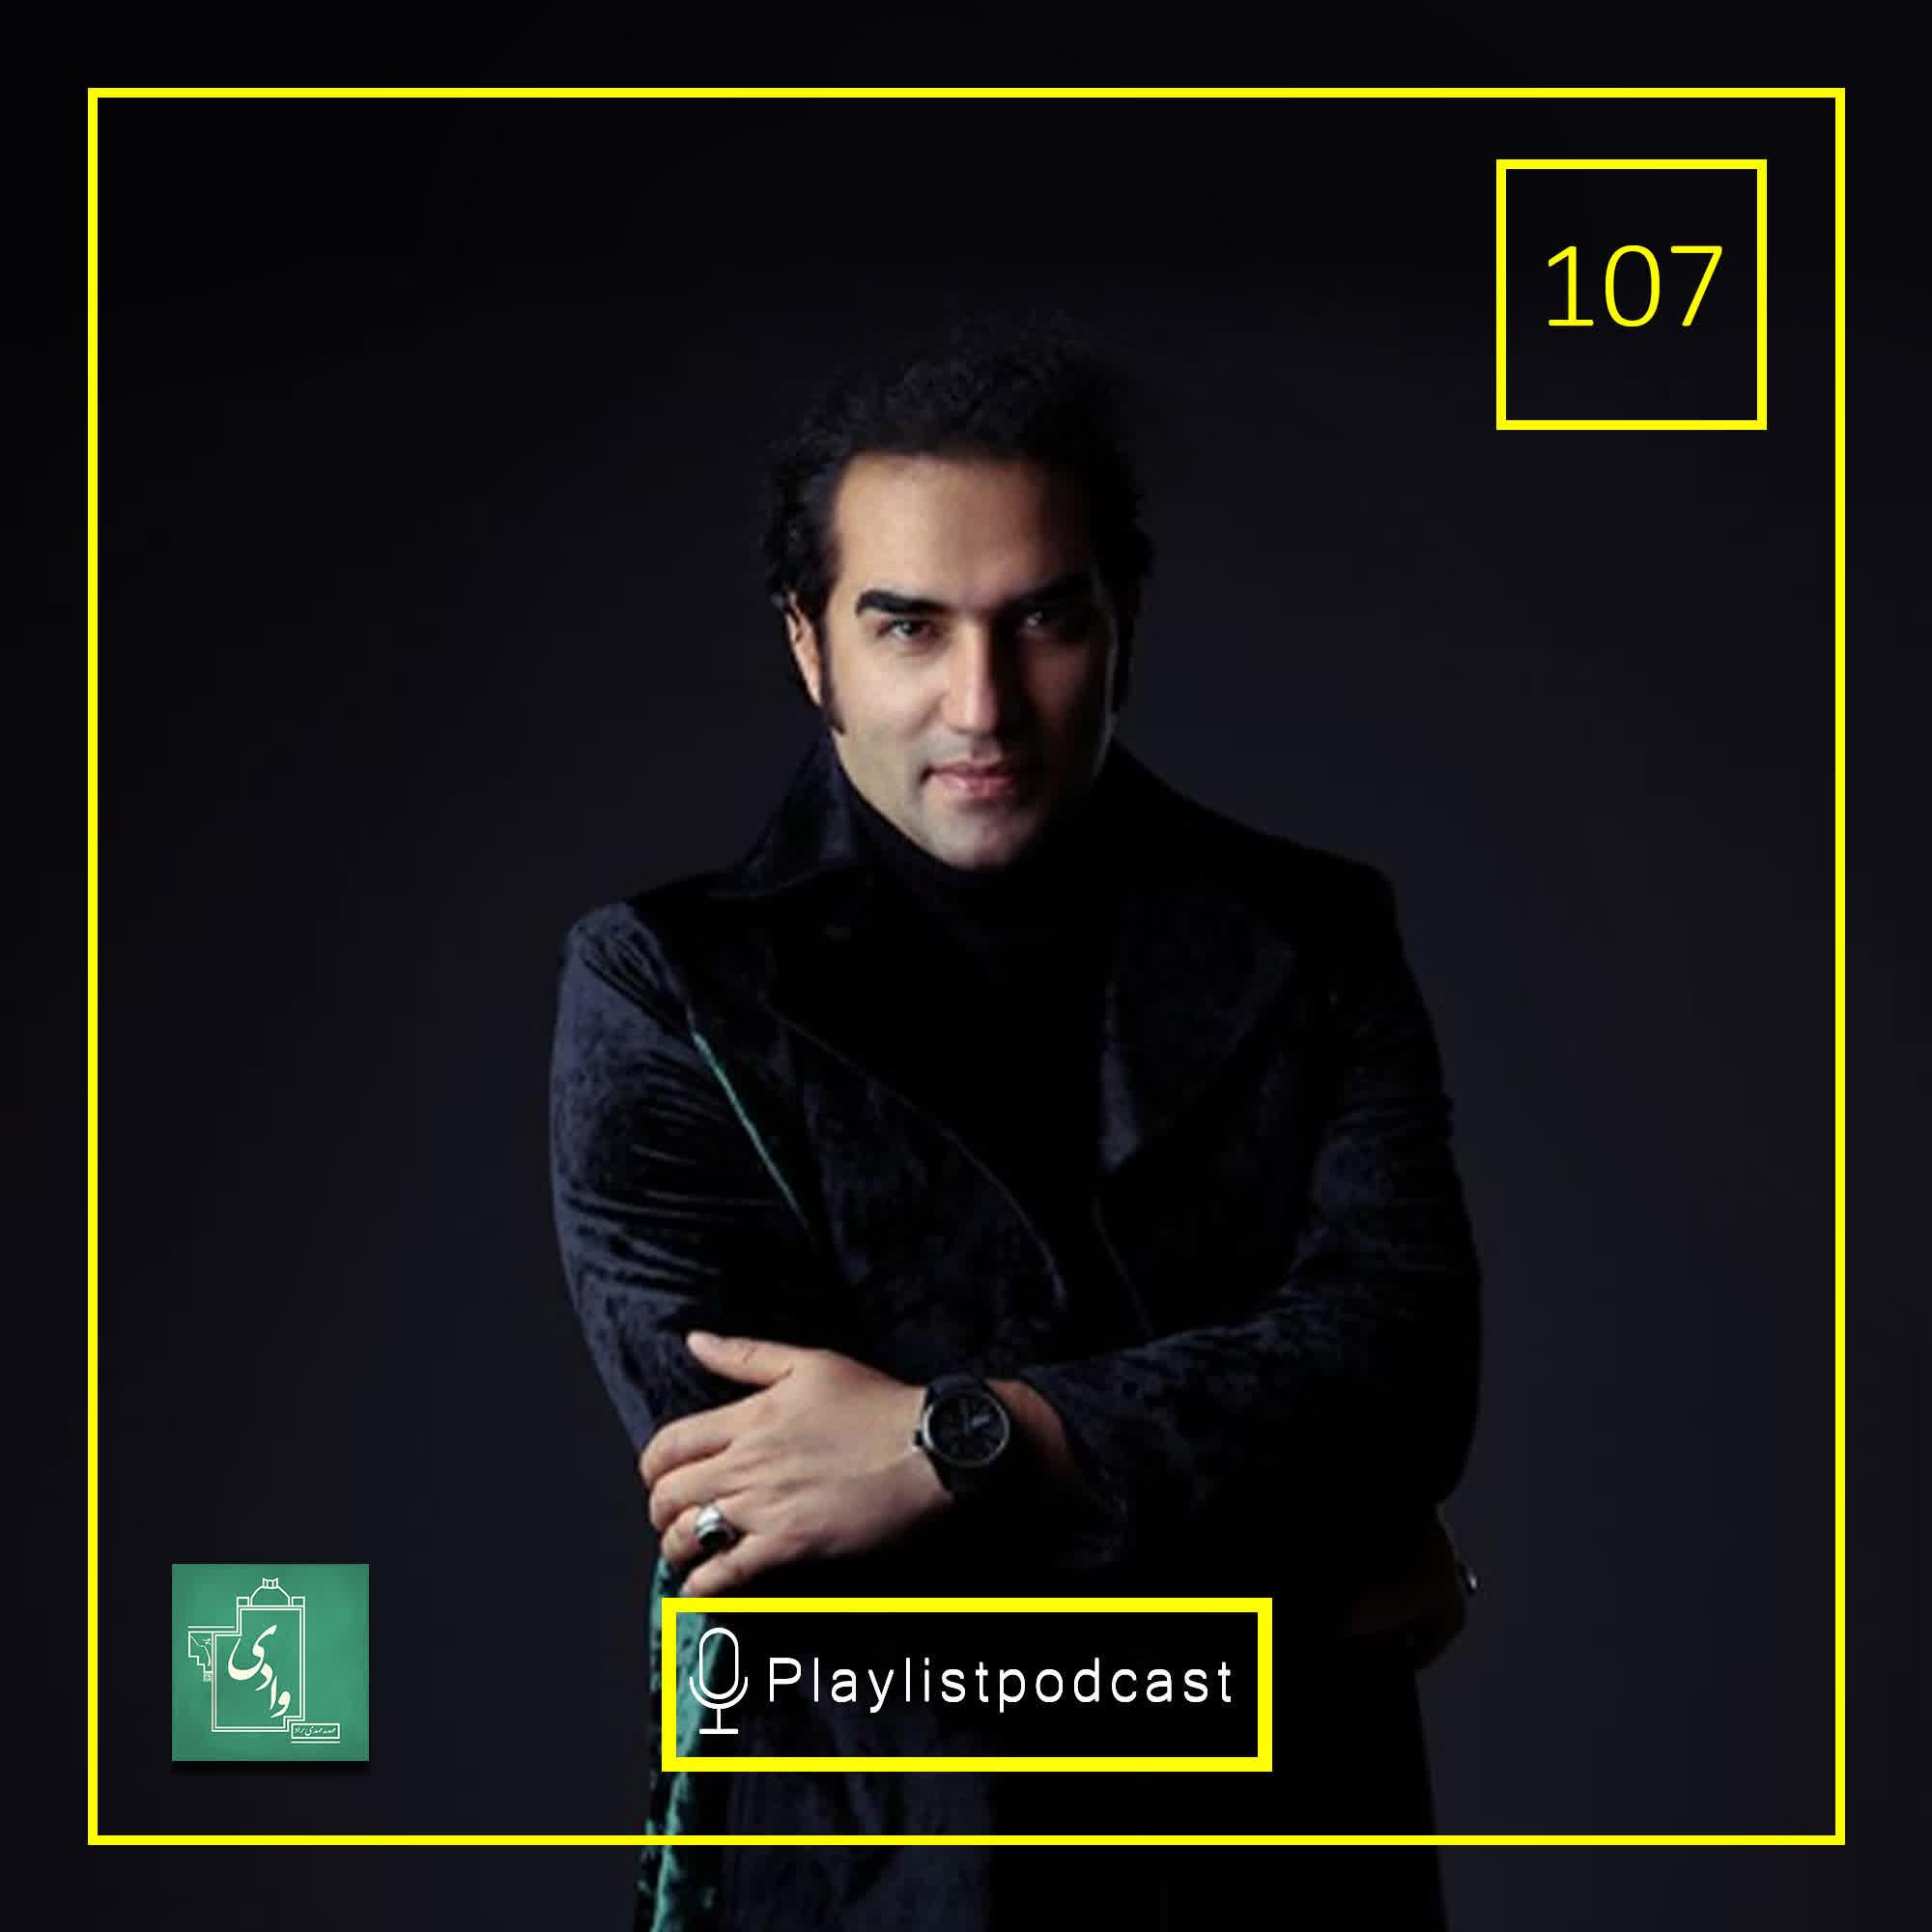 LIVE 107 - پلی لیست لایو - رضا یزدانی